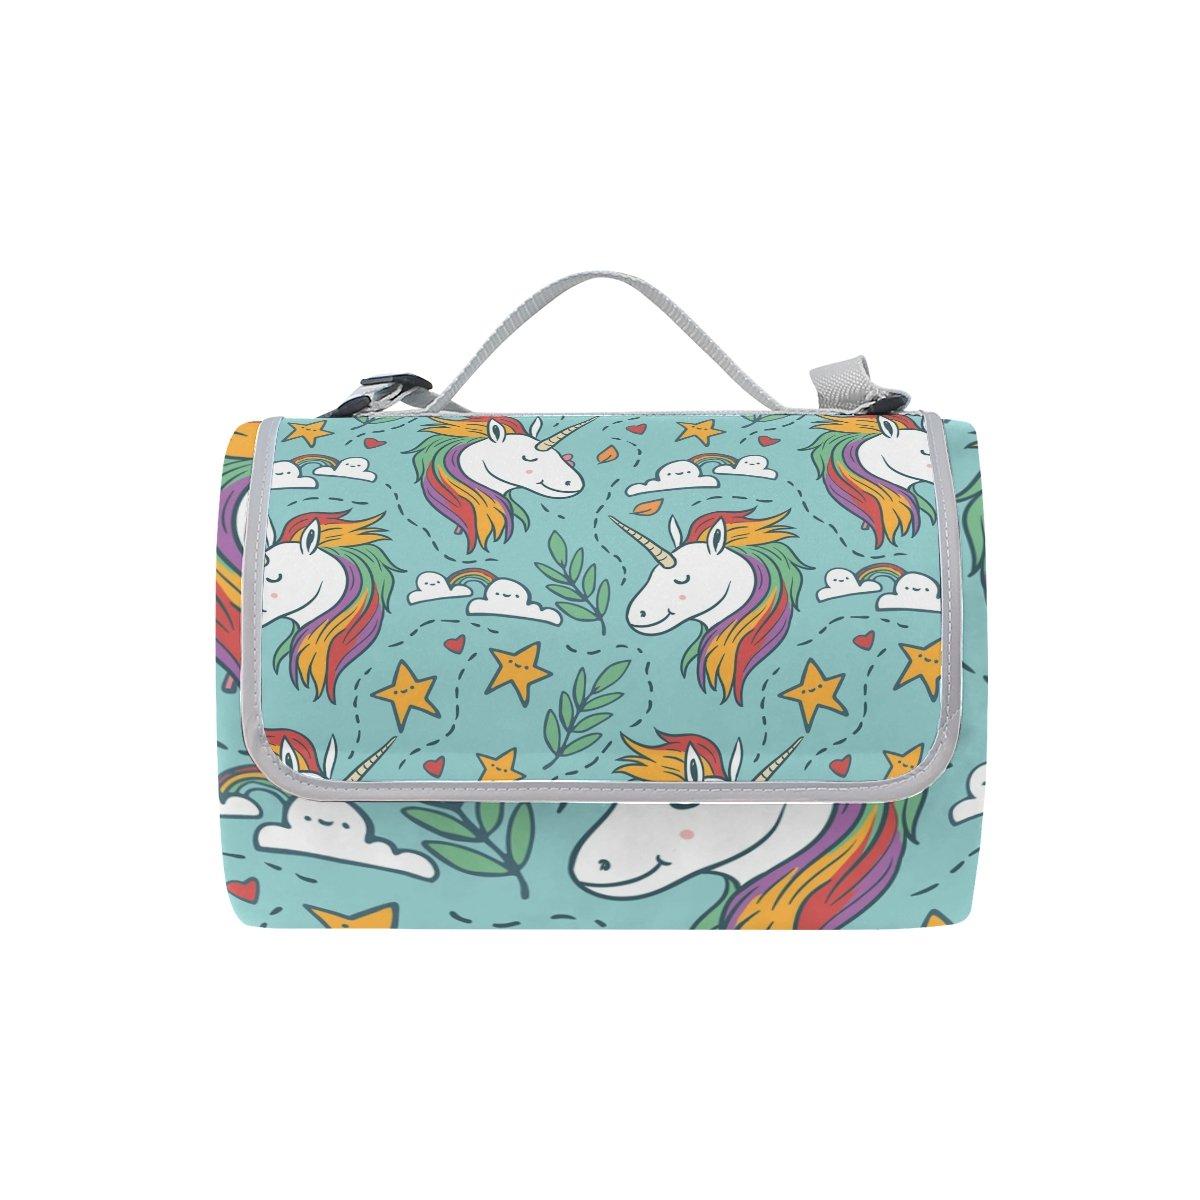 Fengye Cartoon Unicorn Outdoor Handy Picnic Blanket Mat Cover Waterproof Grass Carpets Foldable Tote bag Camping Hiking Beach